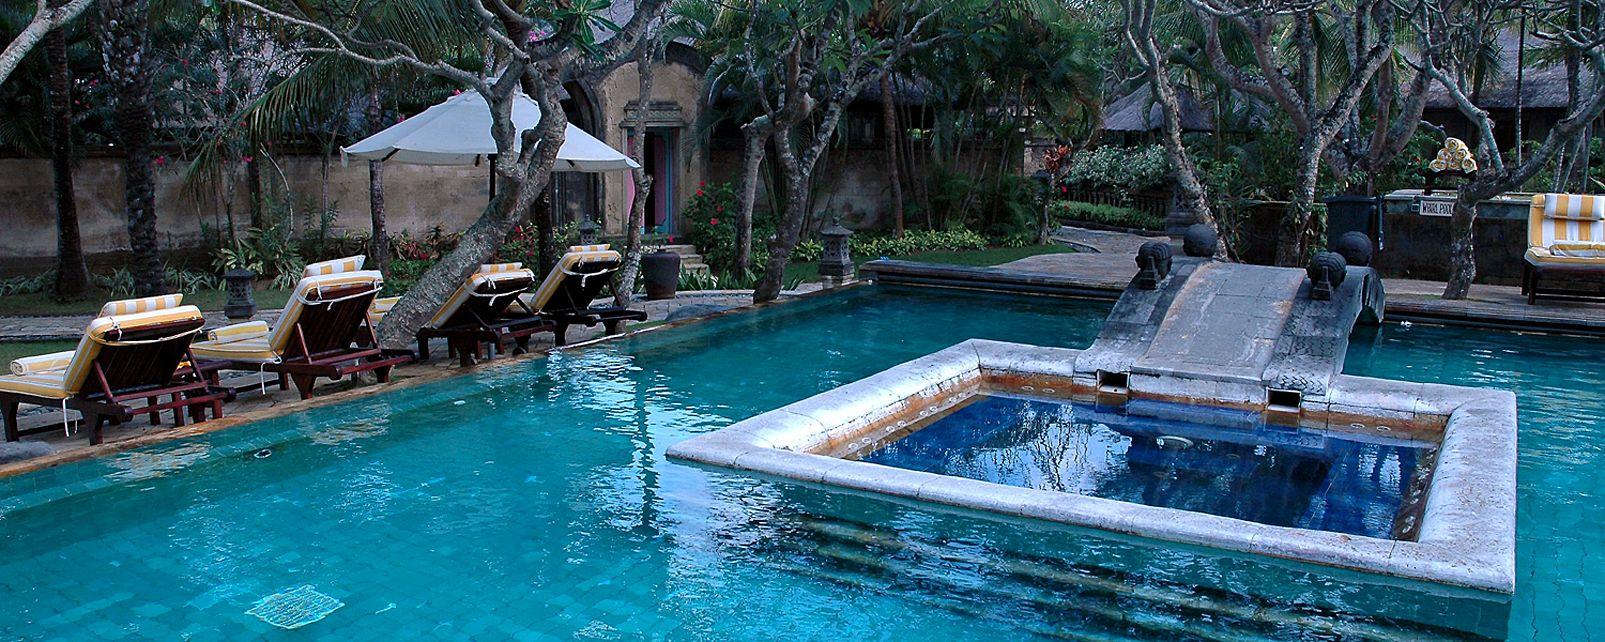 Hotel Sofitel Seminyak Bali